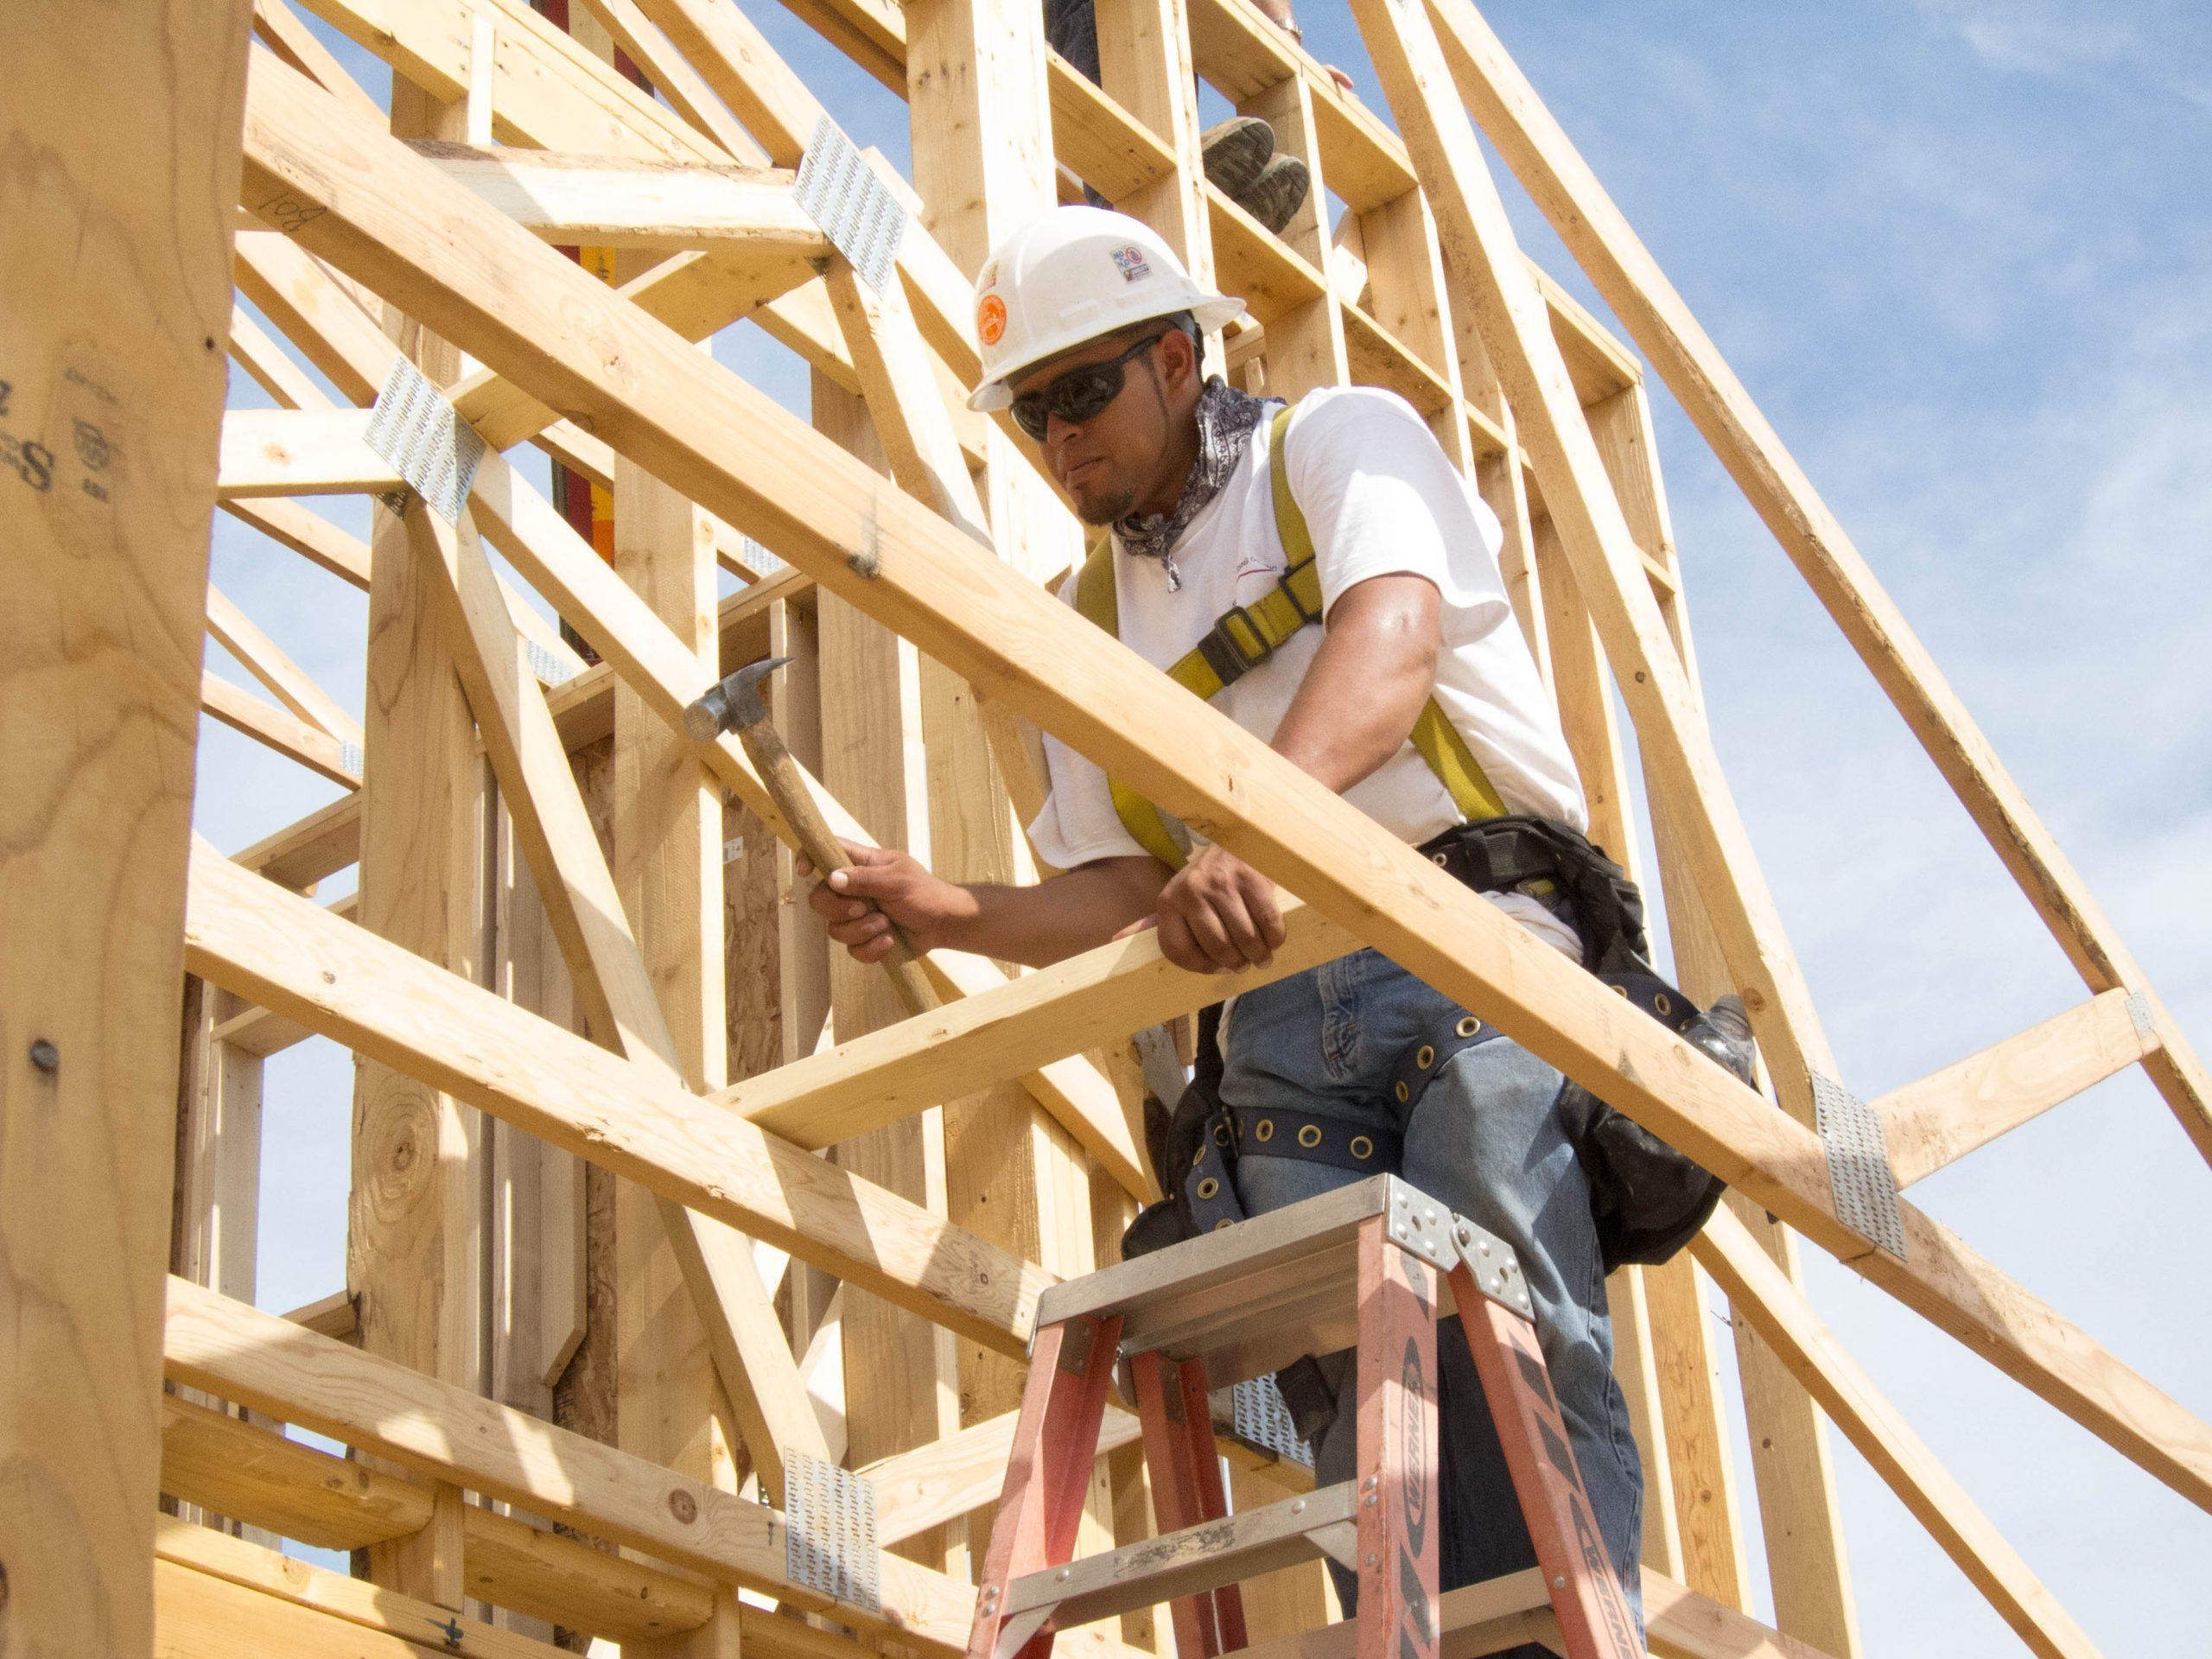 Residential_construction_fall_arrest_system_9256413286.jpg